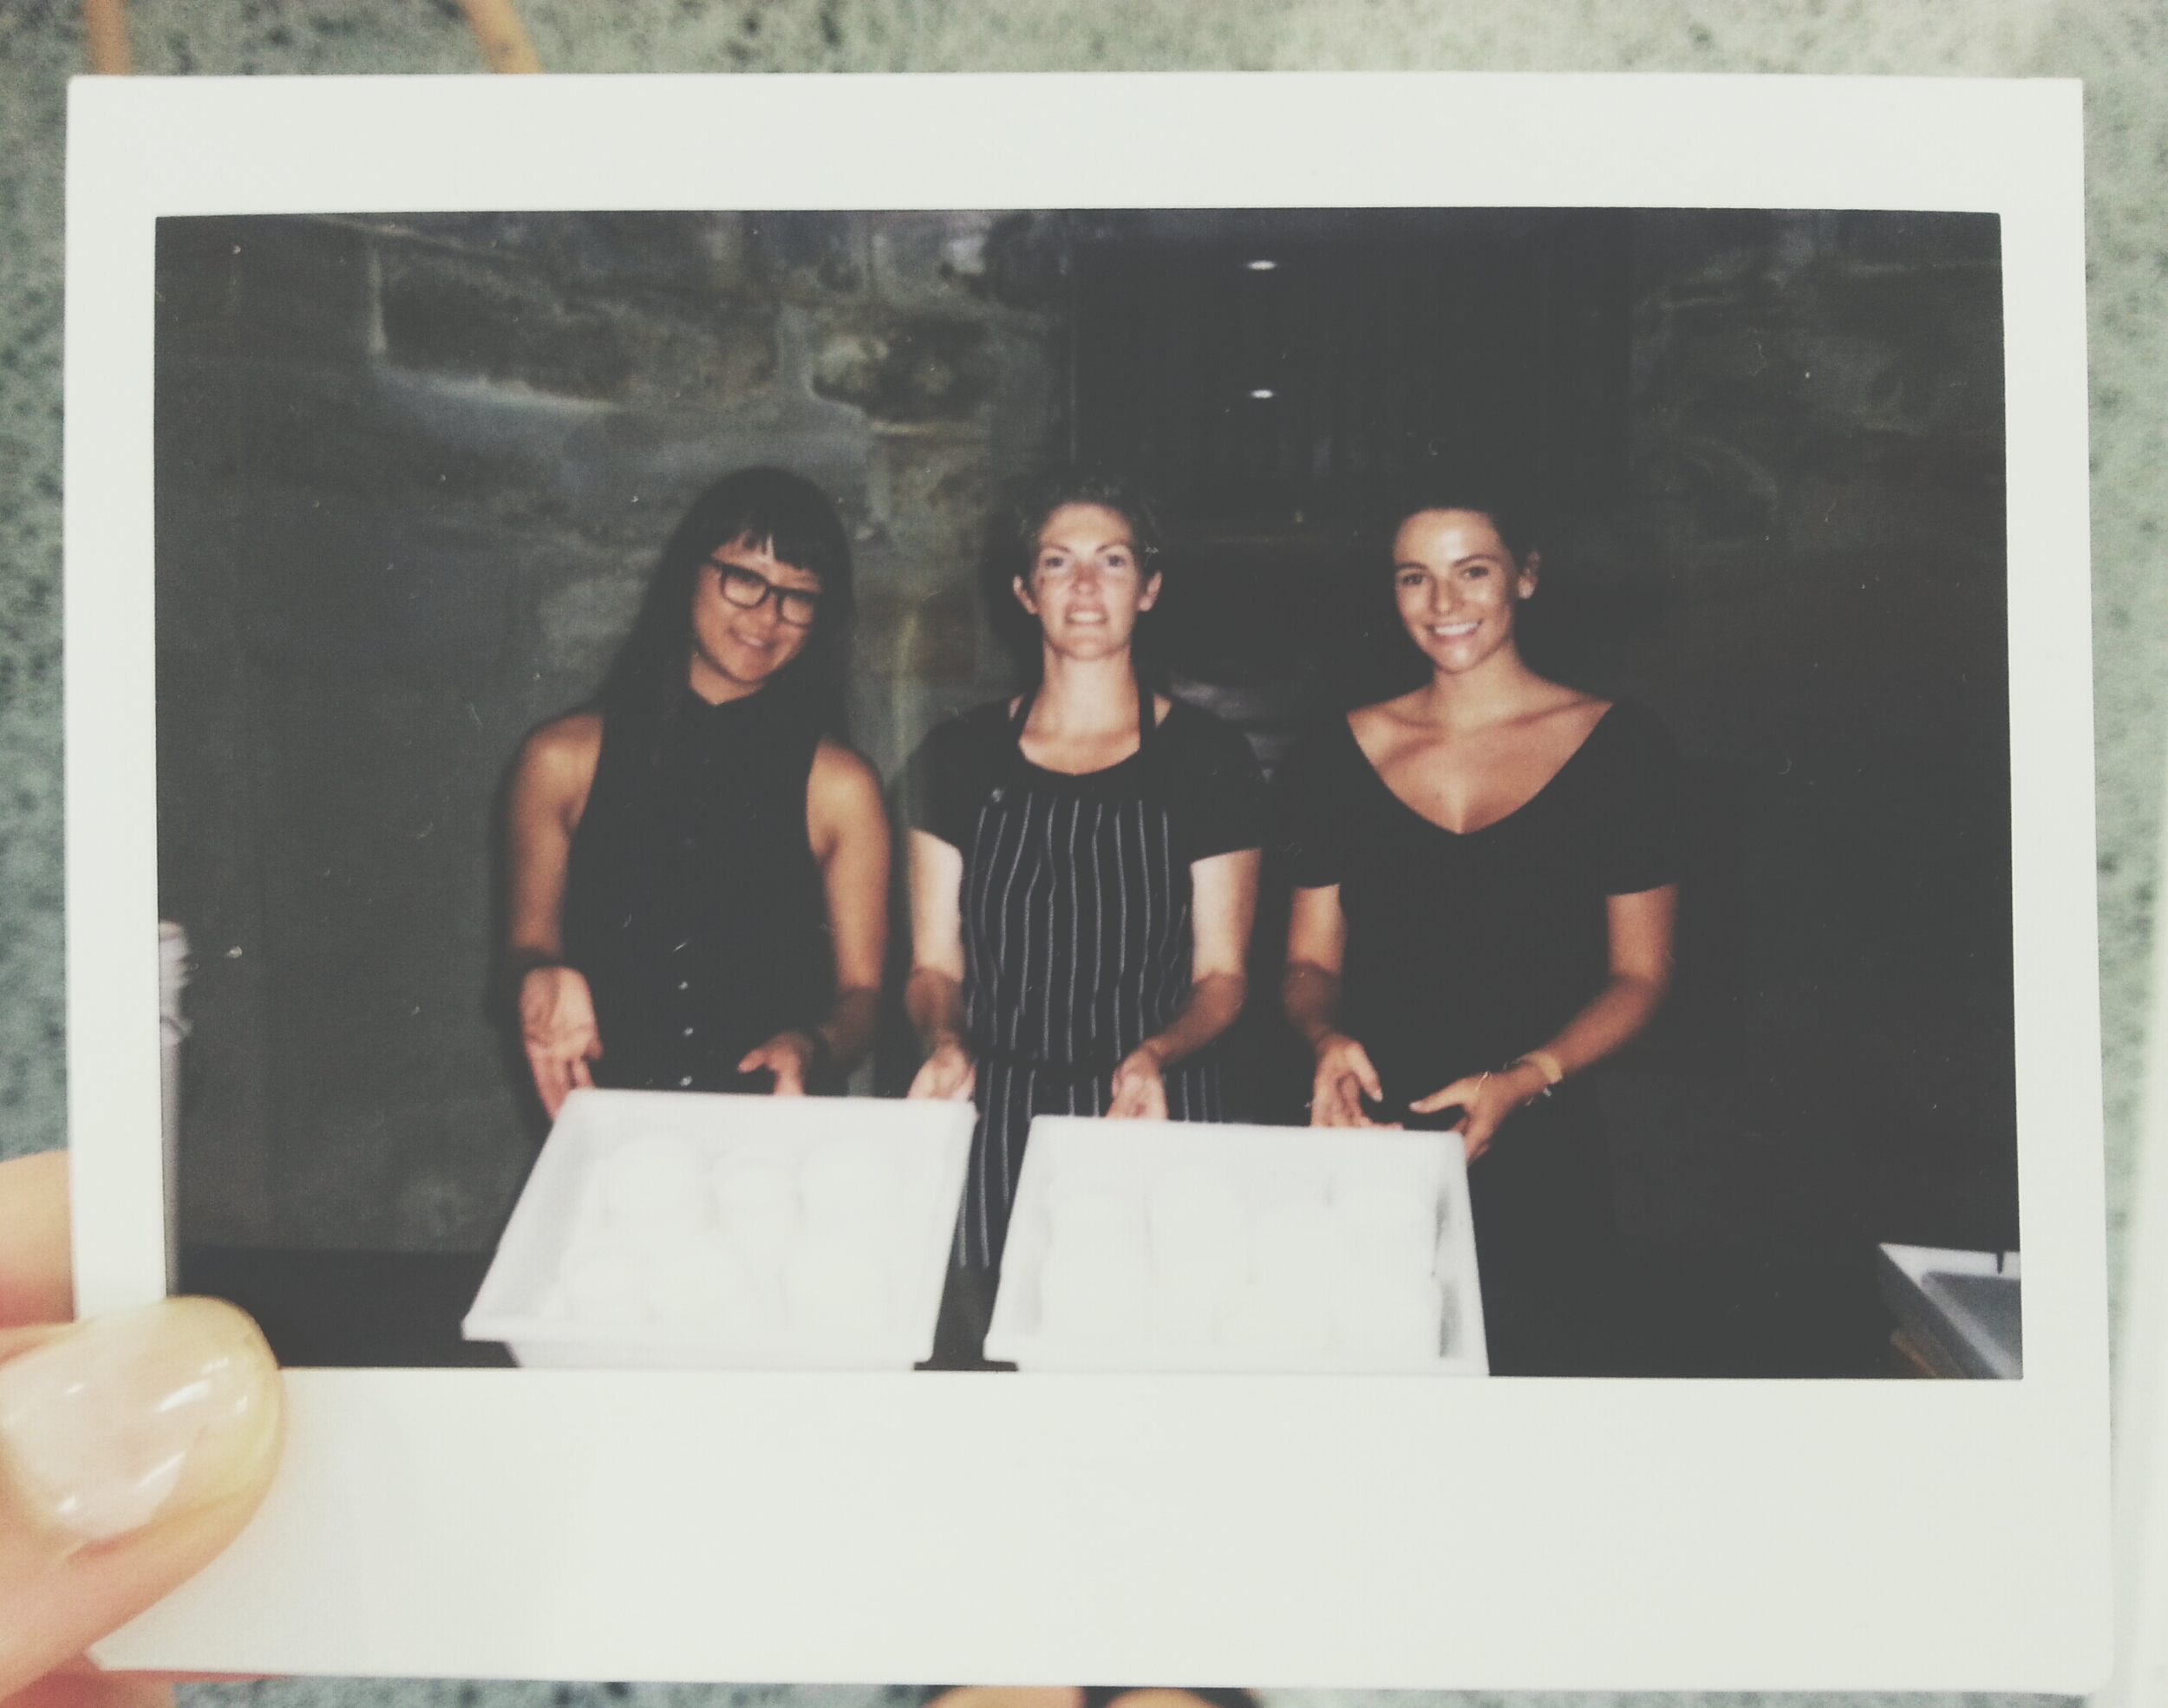 Polaroid: Von, Kristen Allan (artisan cheese maker) and I in the cellars of Elizabeth Bay House.